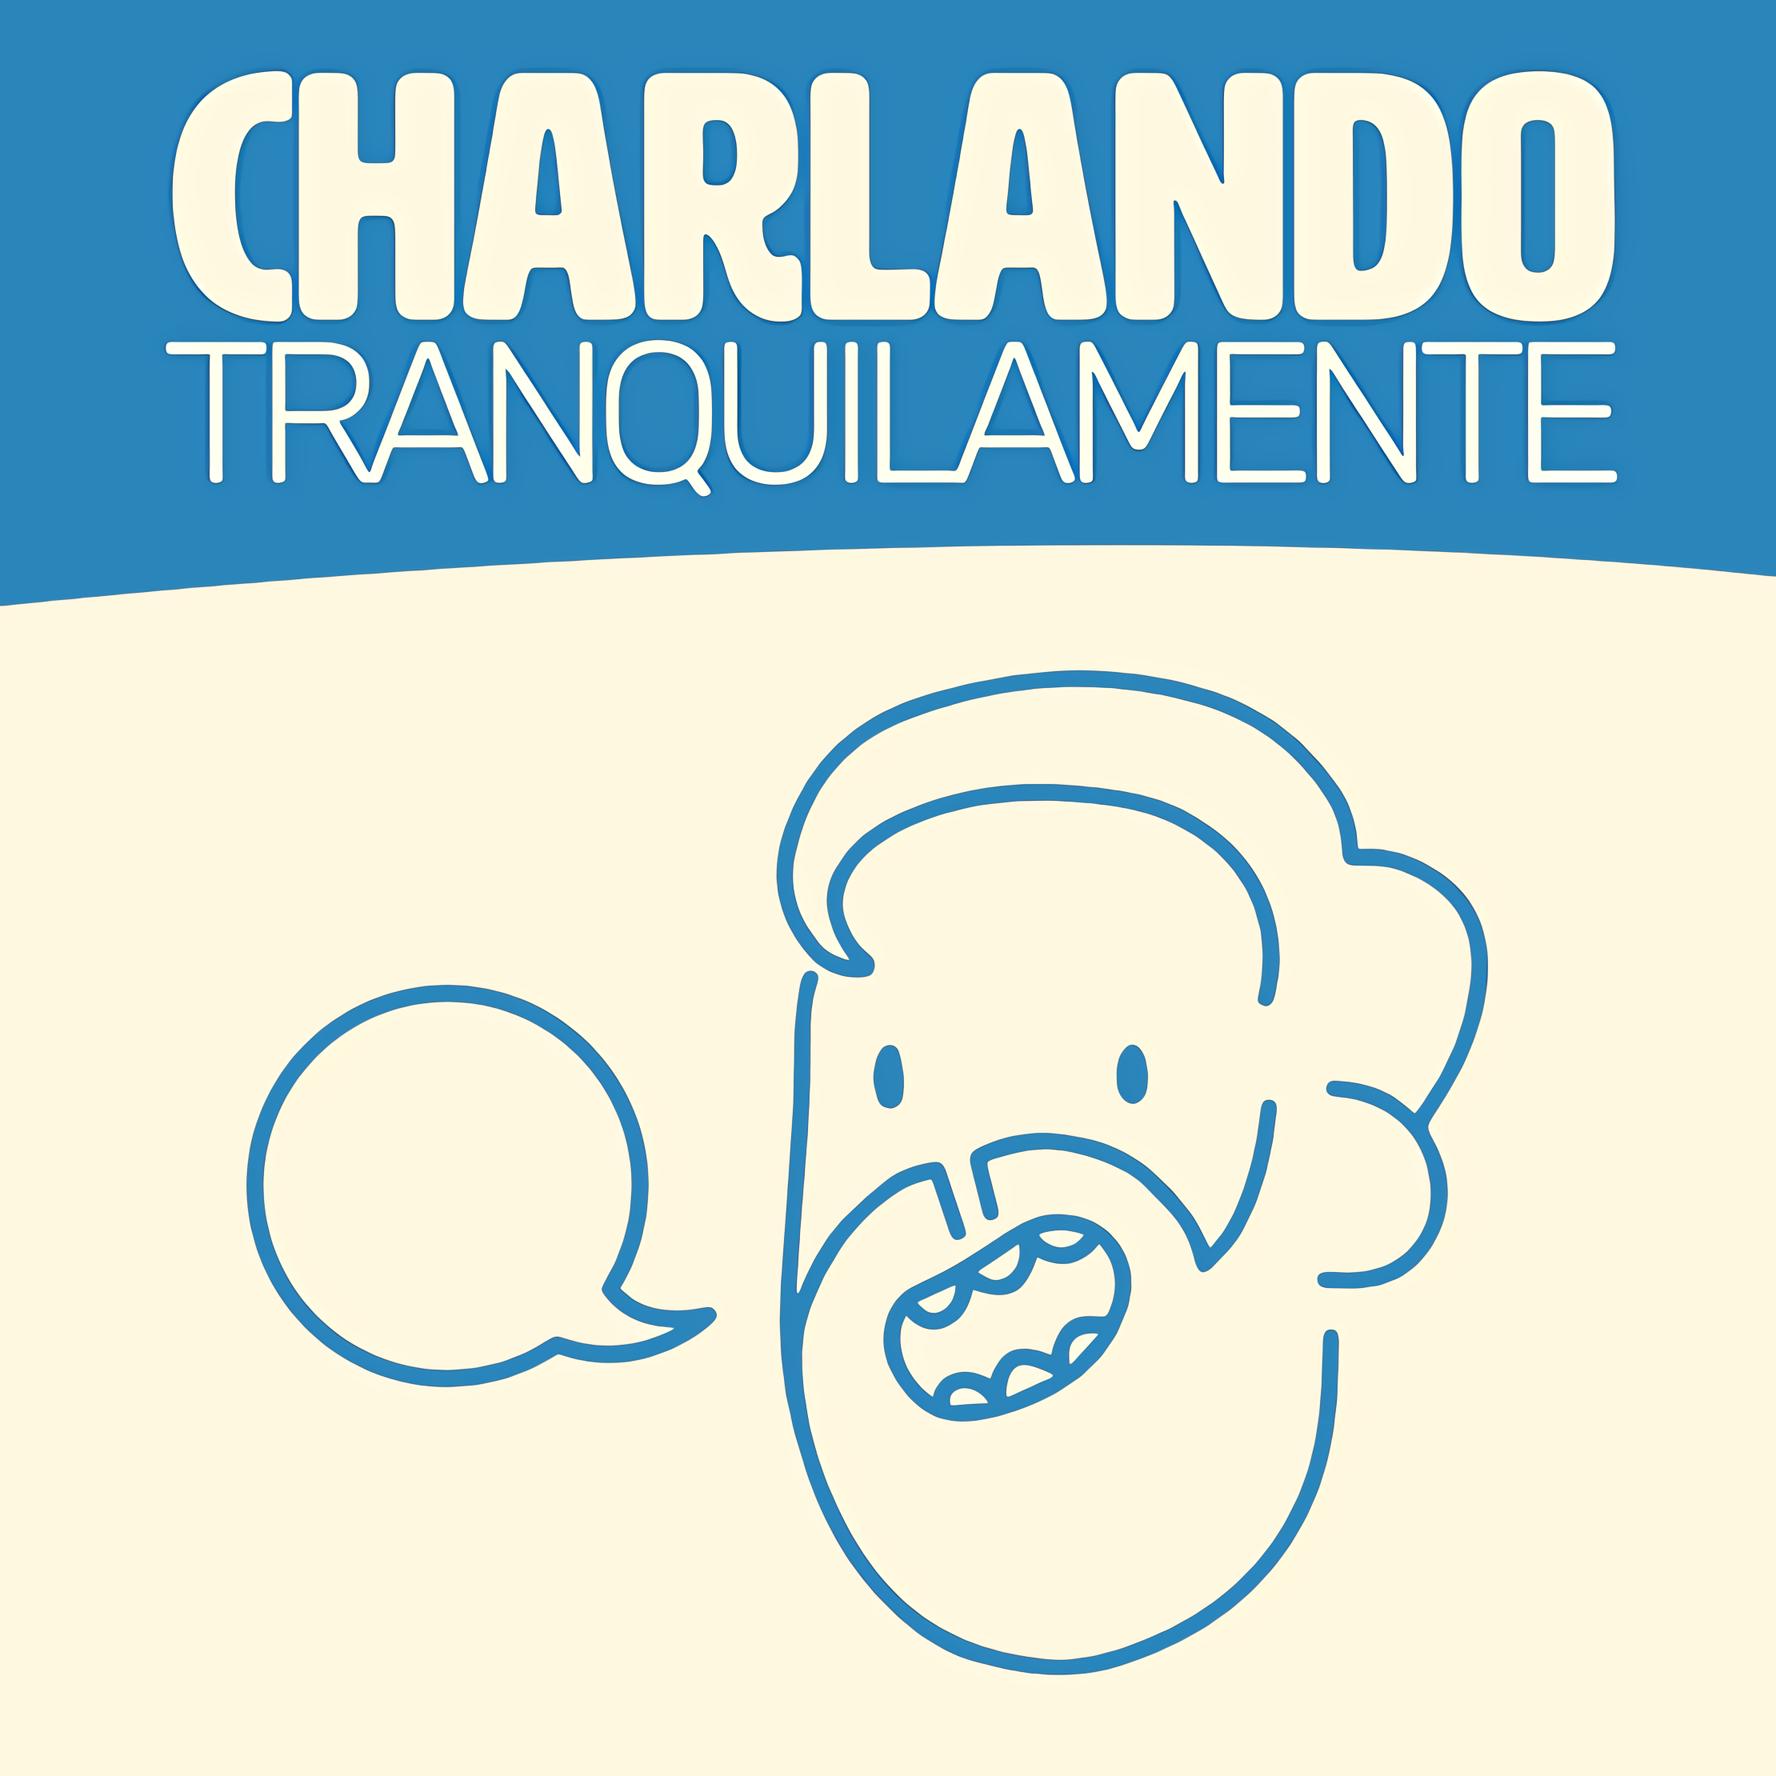 Charlando Tranquilamente #15 con JHAY CORTEZ